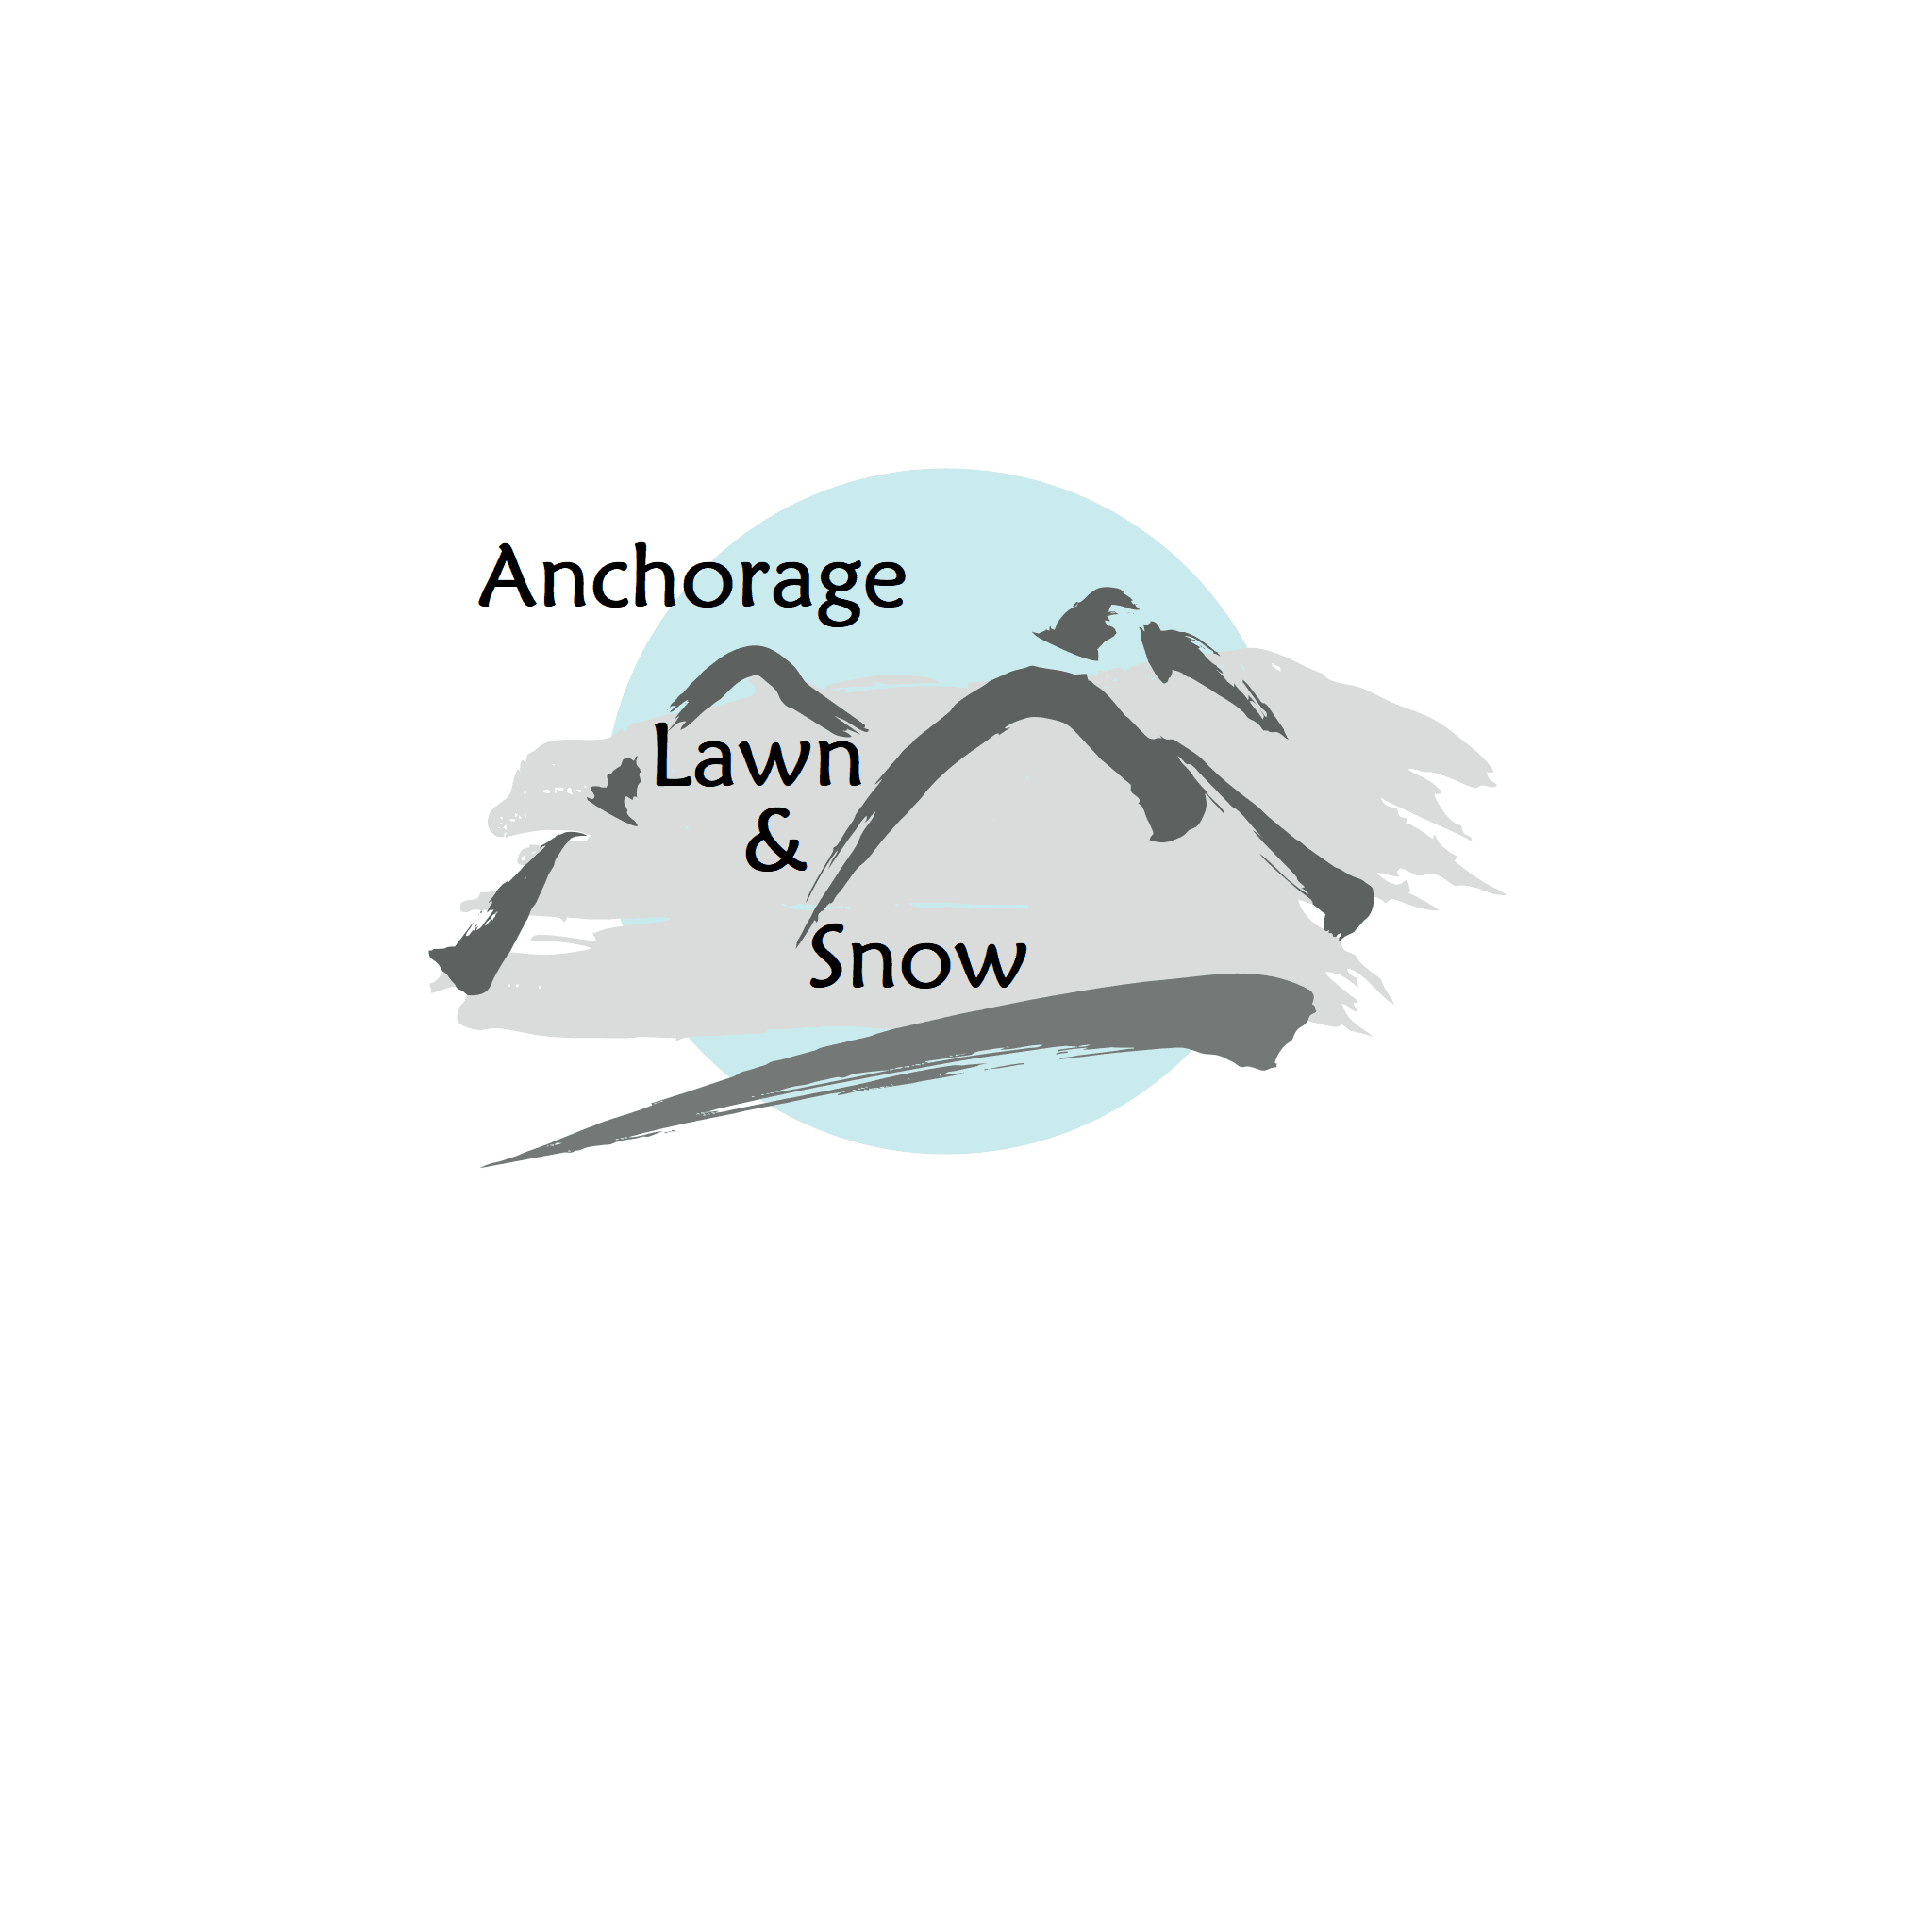 Anchorage Lawn & Snow Services